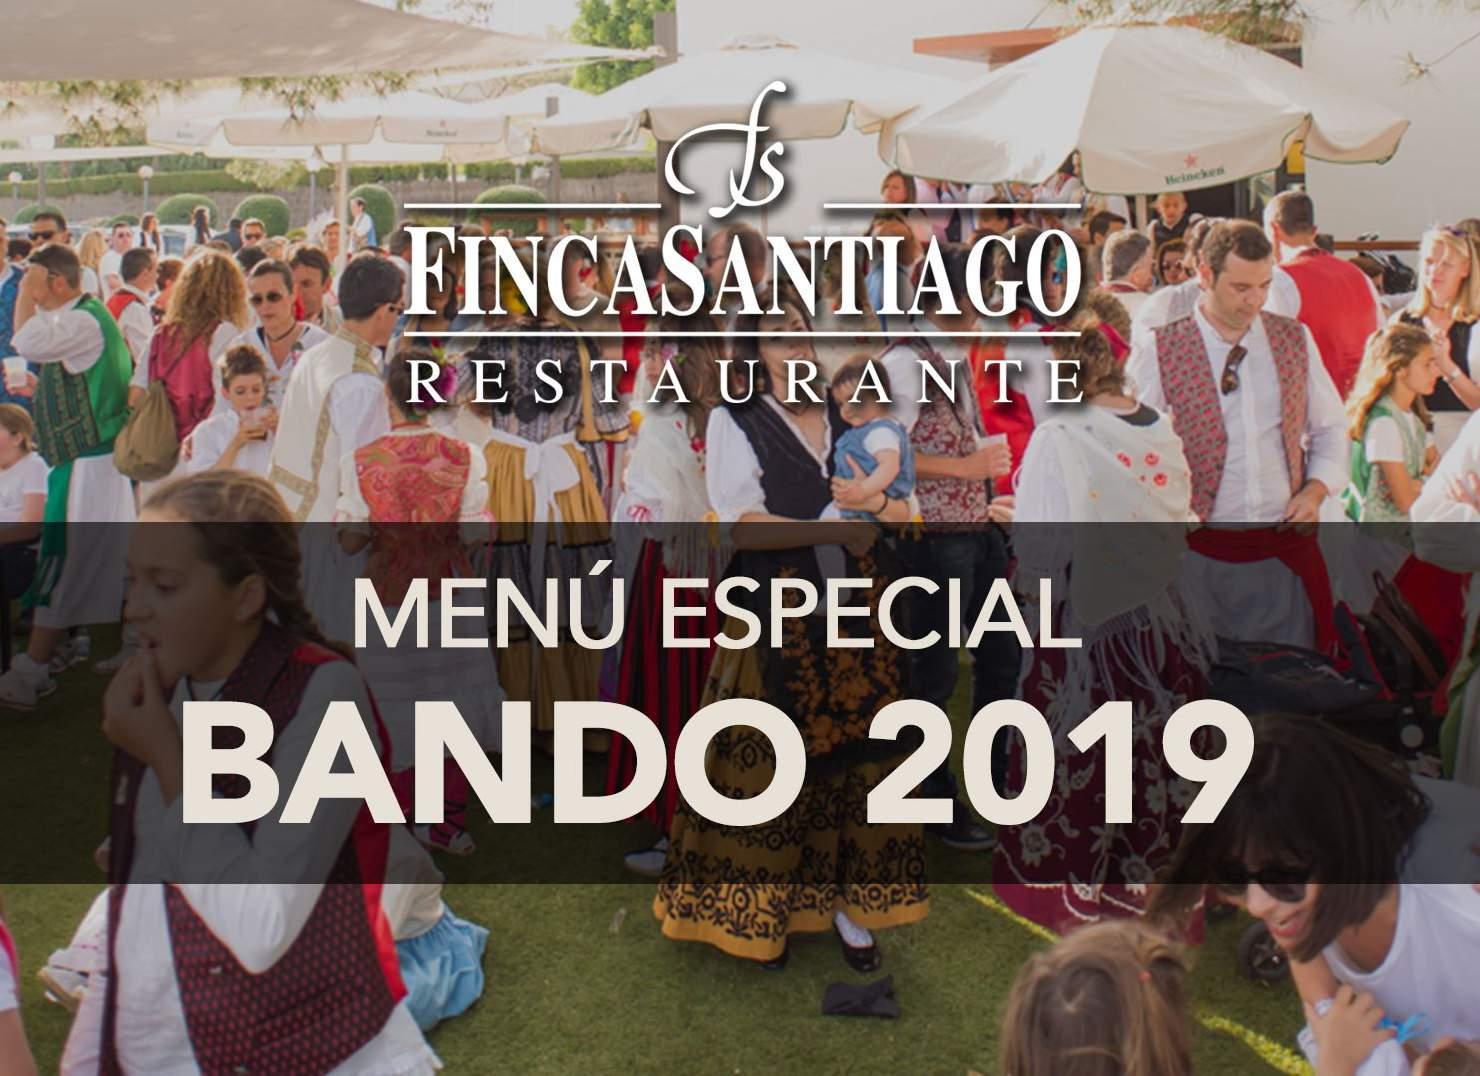 menu-bando-2019.jpg